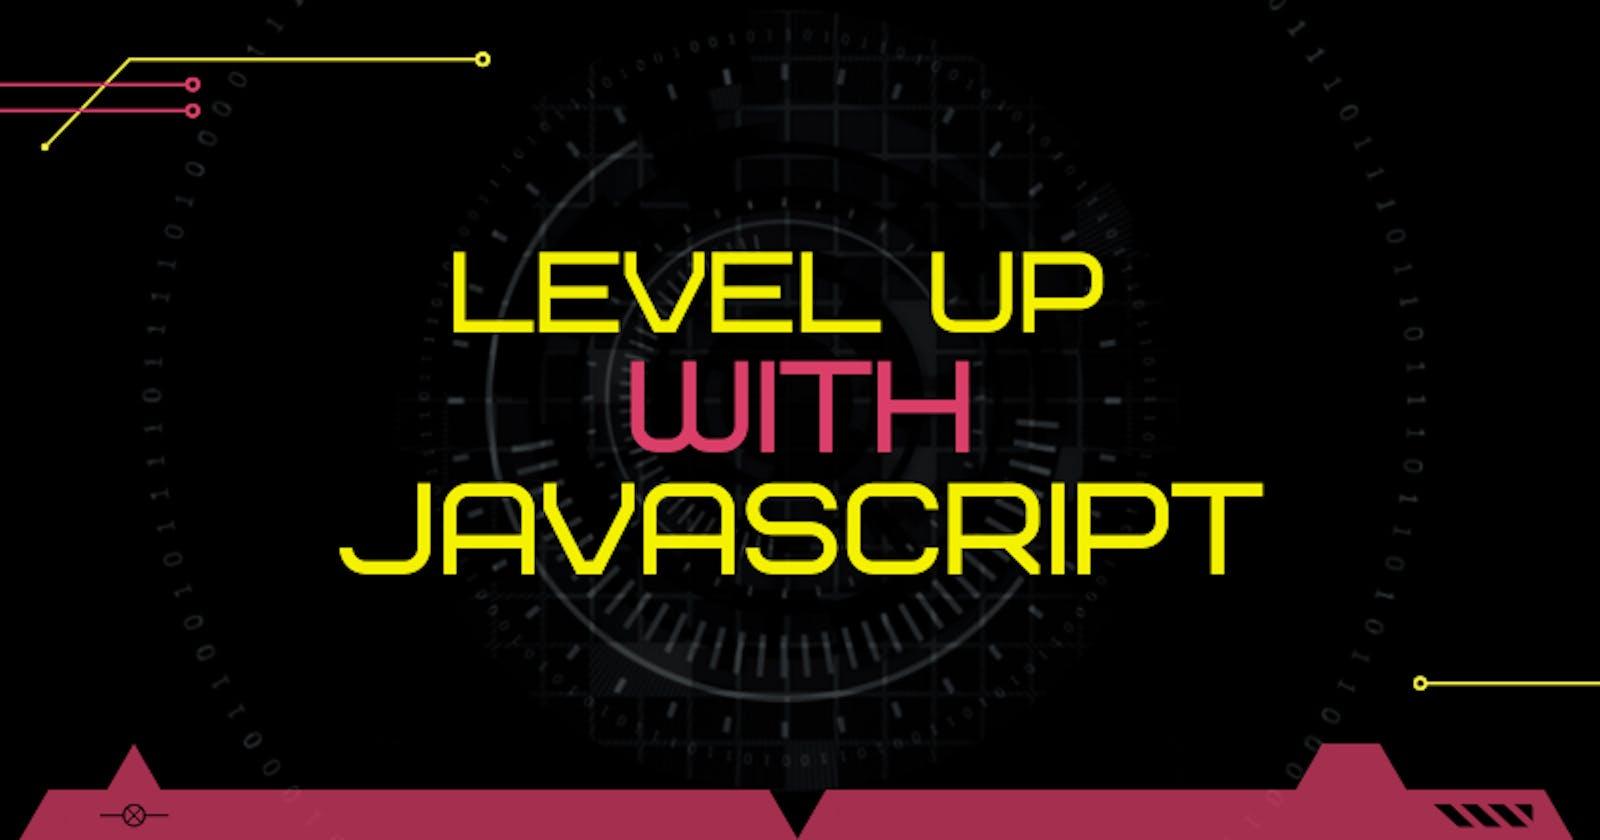 LEVEL UP! Boost your JavaScript skills, LVL 3